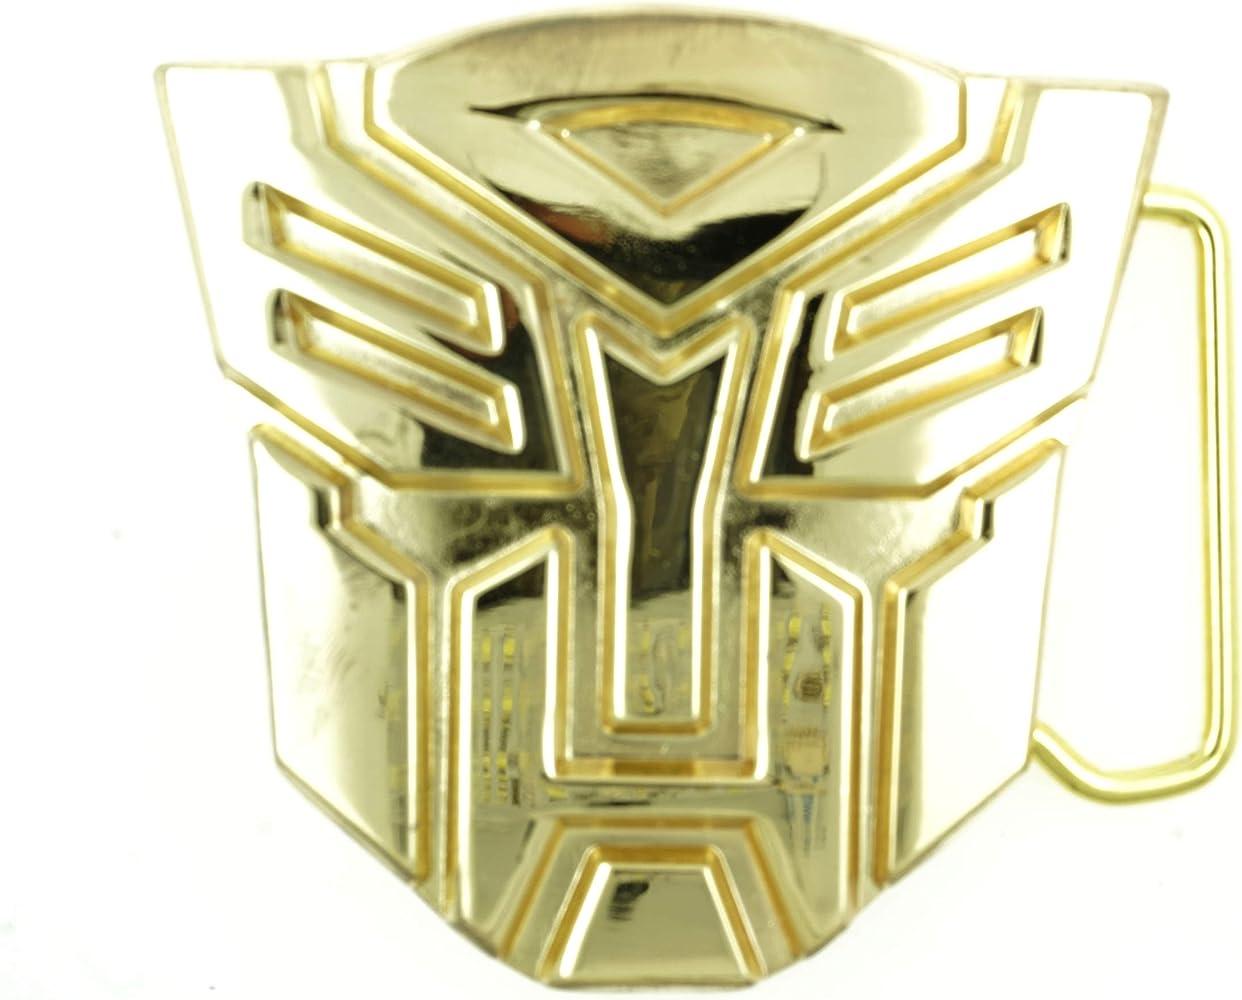 Autobot Transformers Metal Belt Buckle